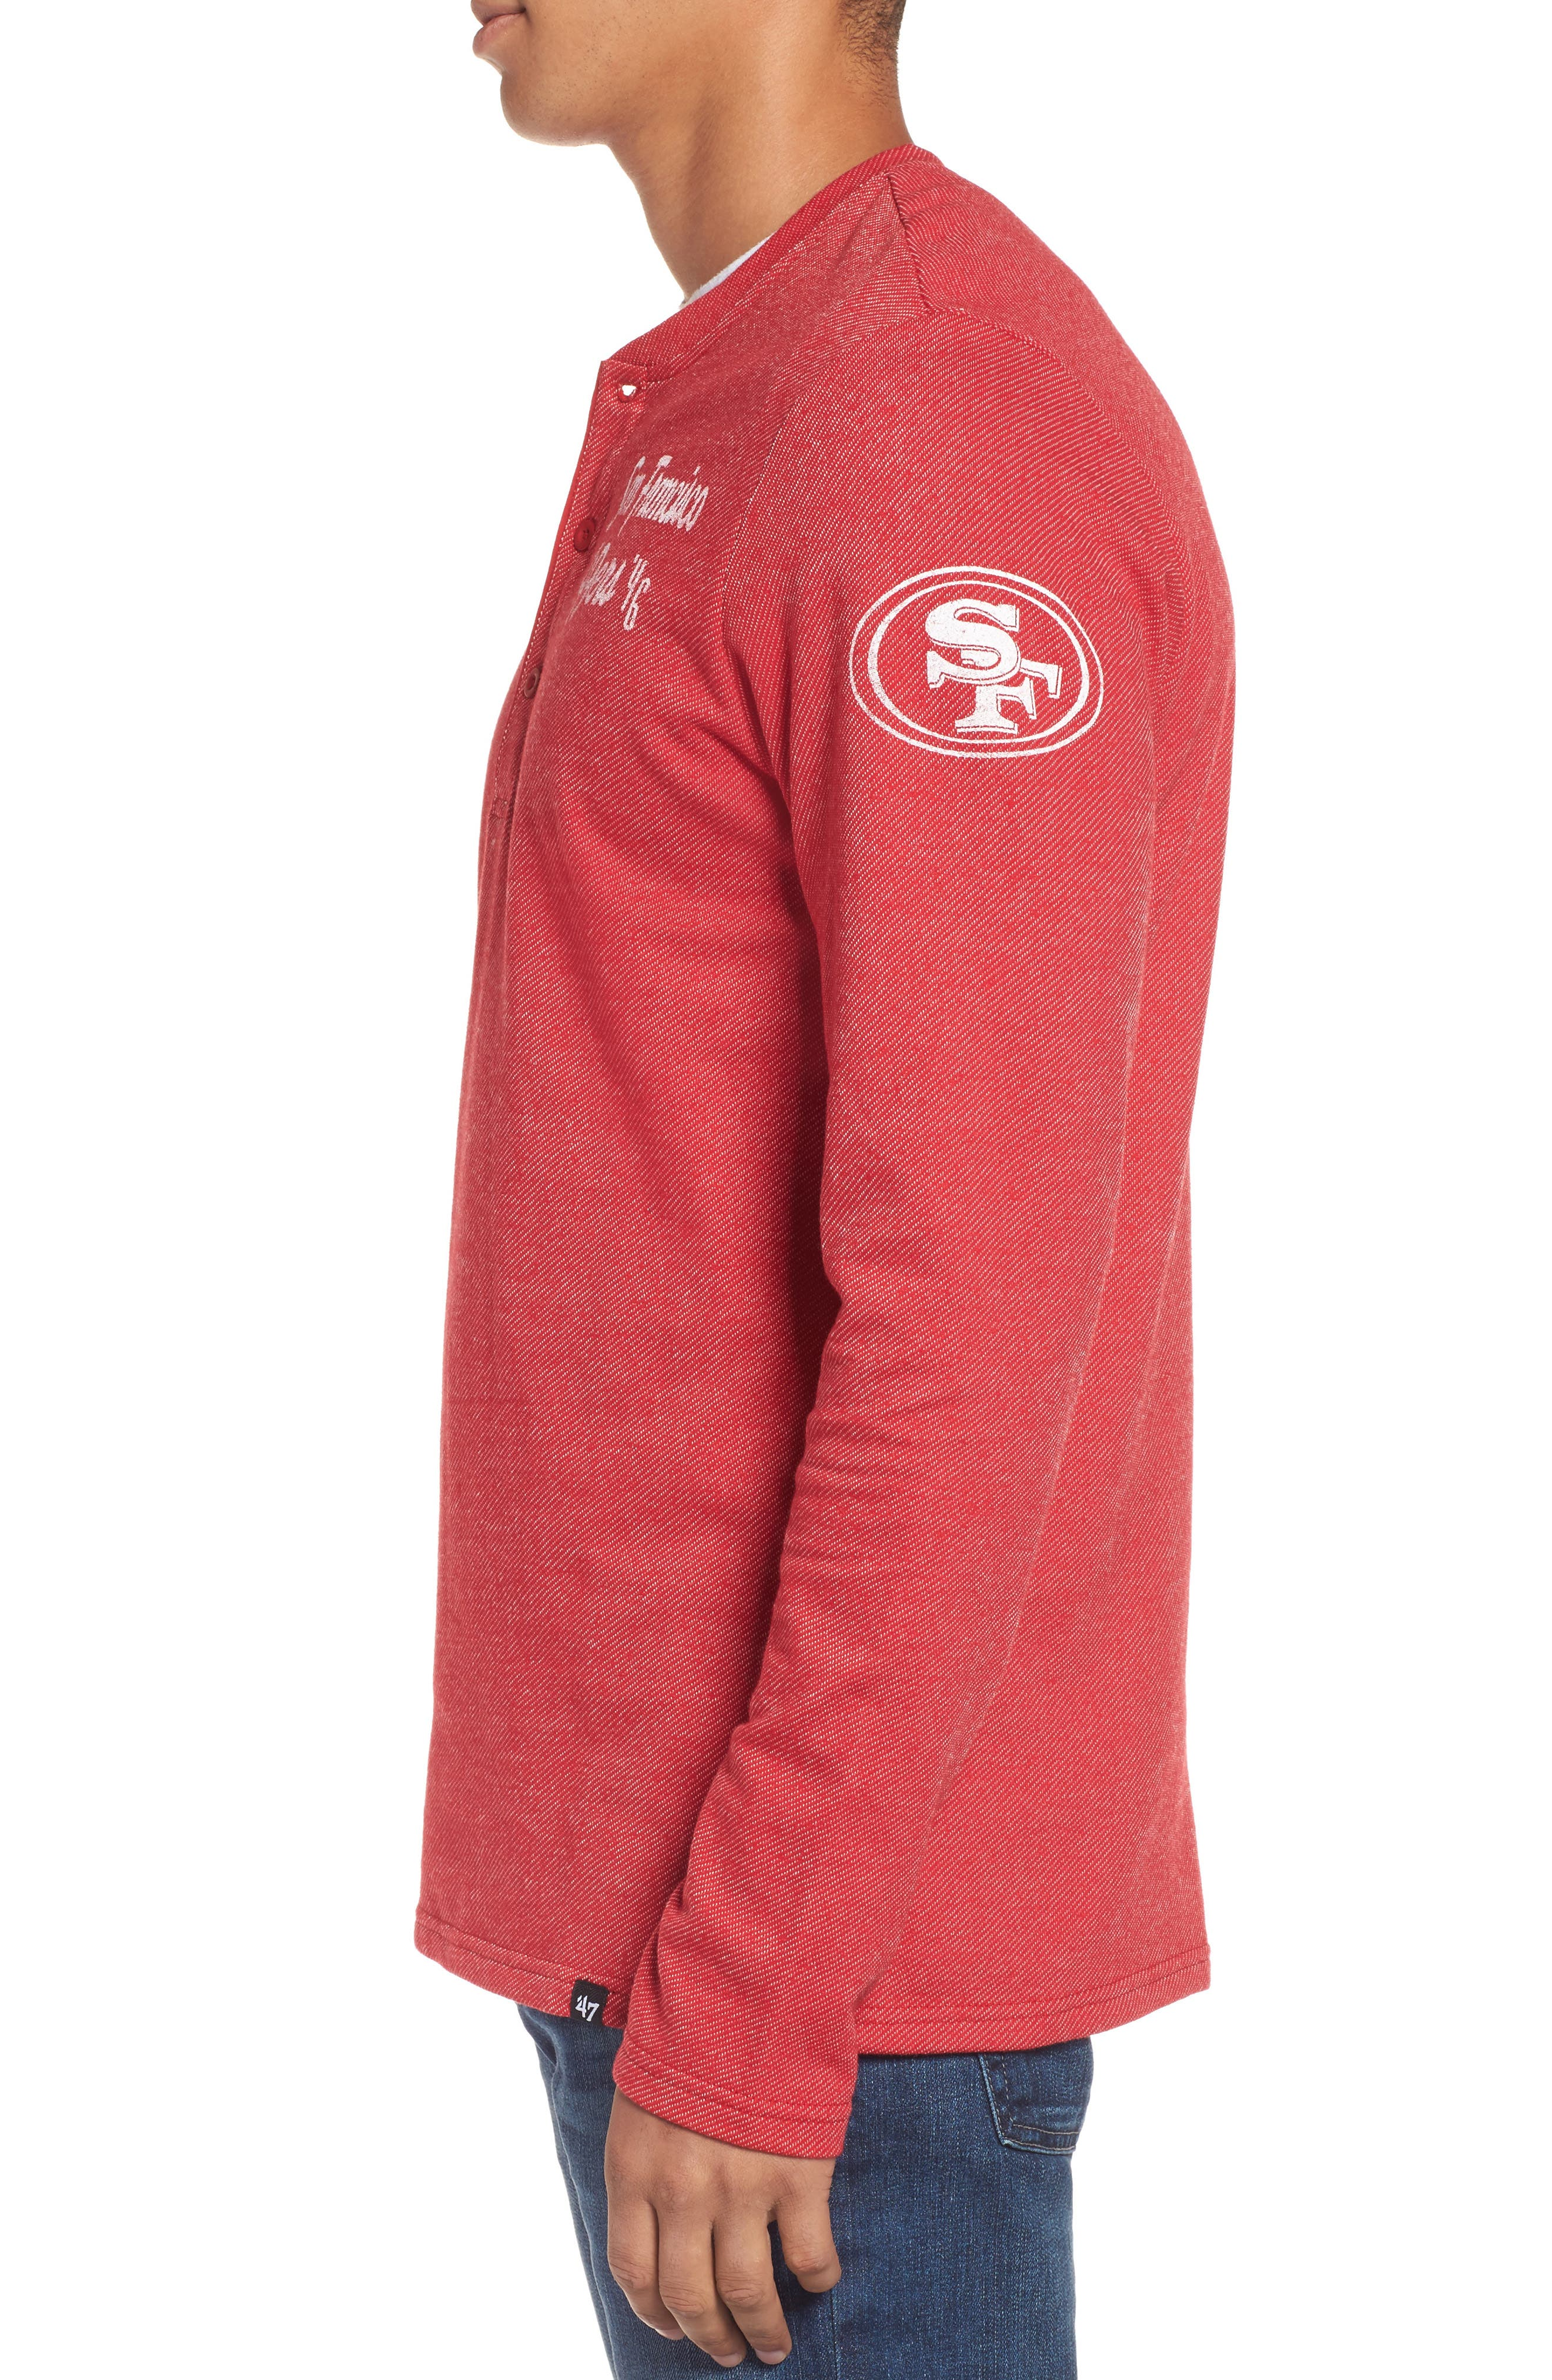 San Francesco 49ers Henley,                             Alternate thumbnail 3, color,                             600